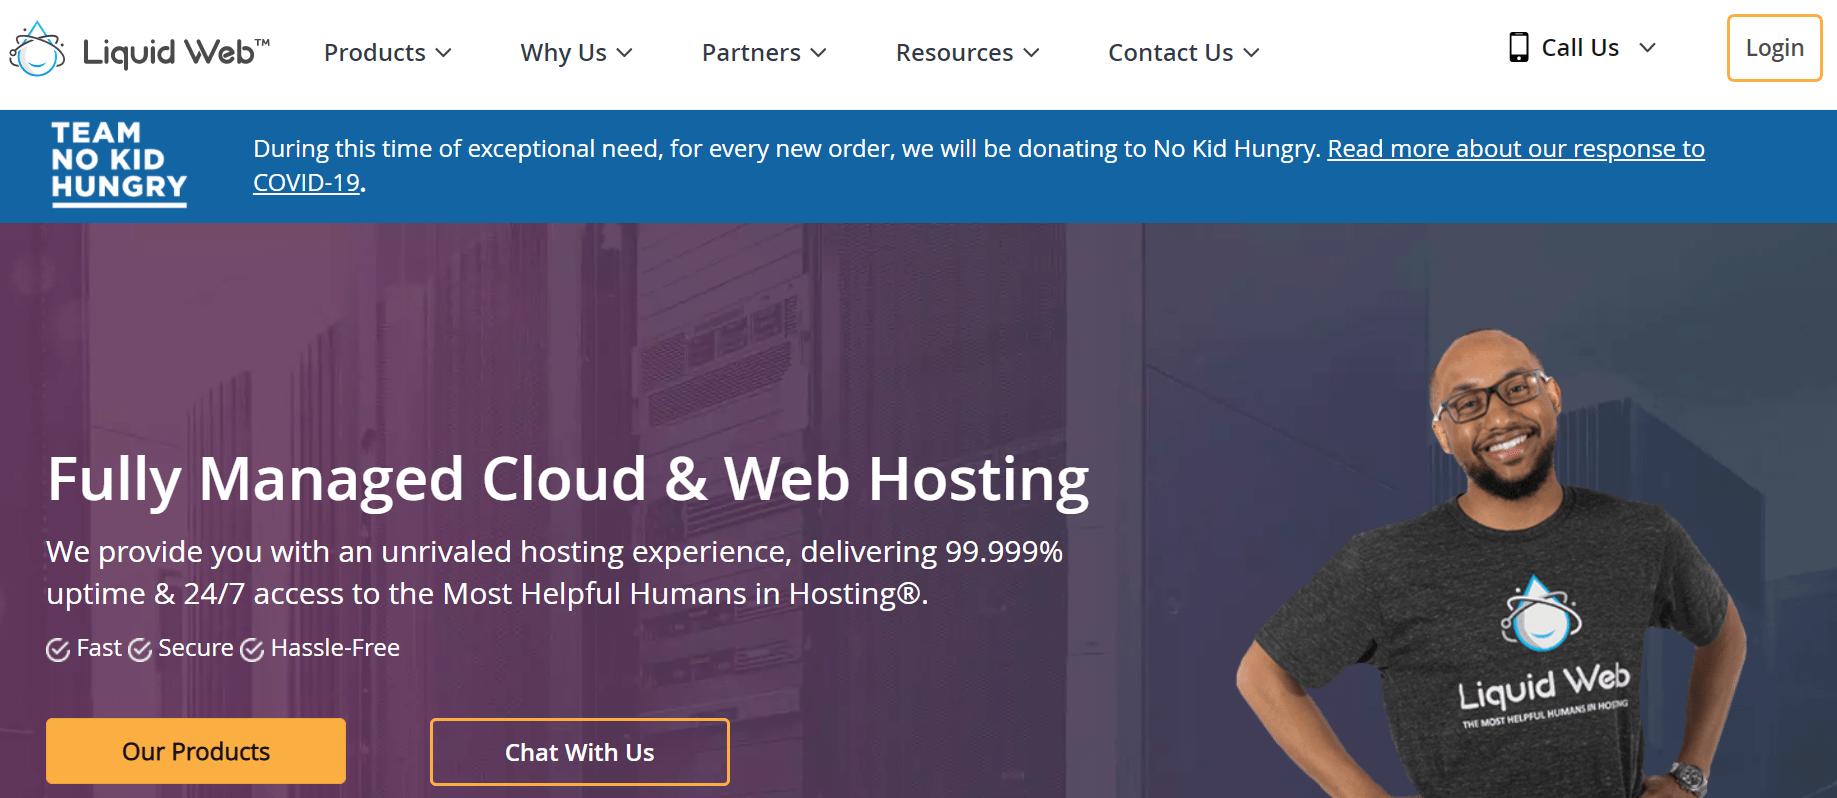 Liquid Web主页。